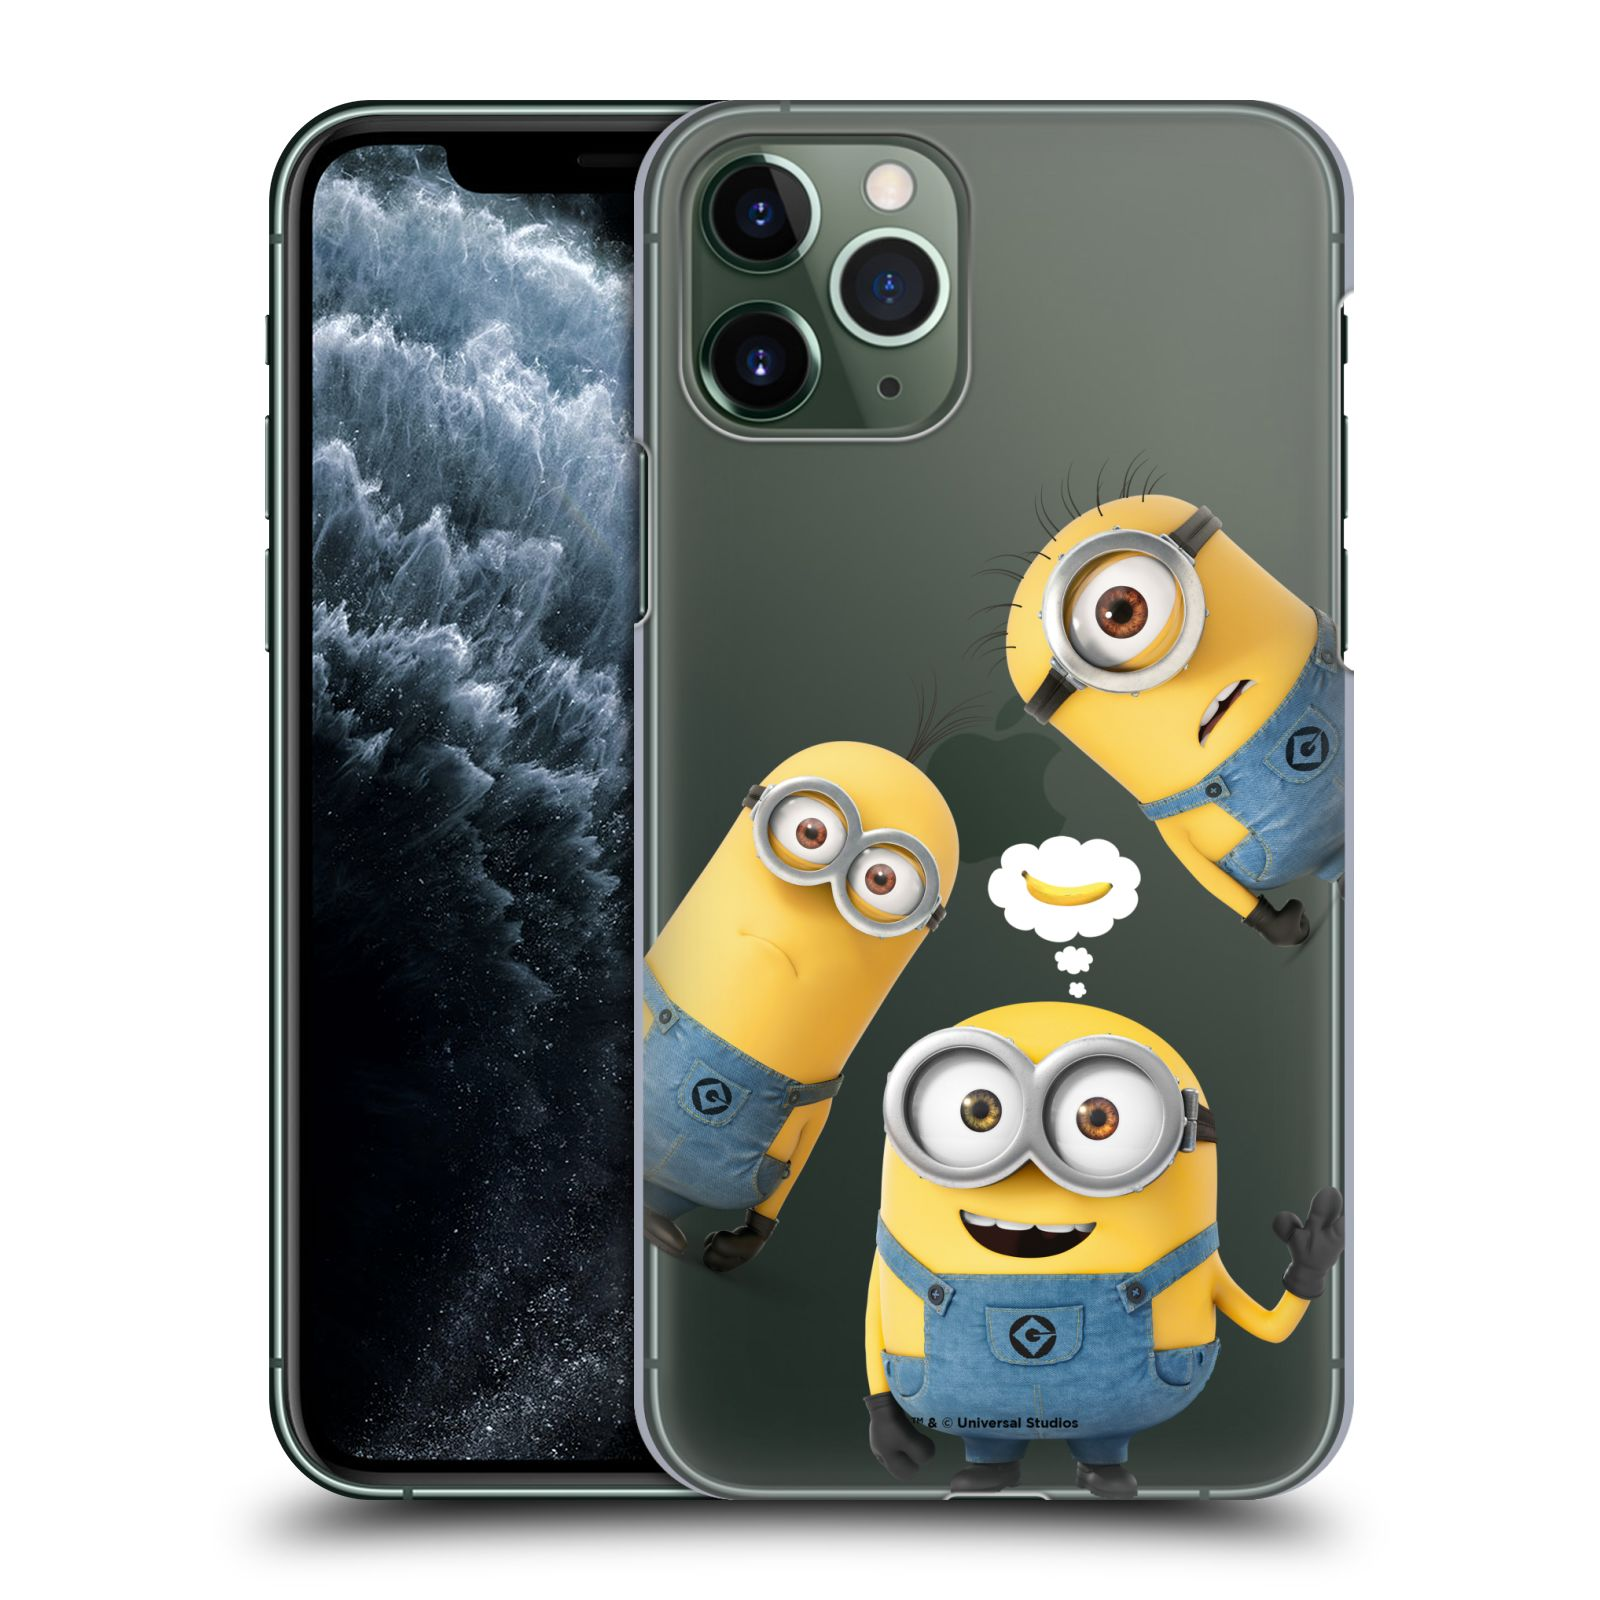 Plastové pouzdro na mobil Apple iPhone 11 Pro - Head Case - Mimoni Banana z filmu Já, padouch - Despicable Me